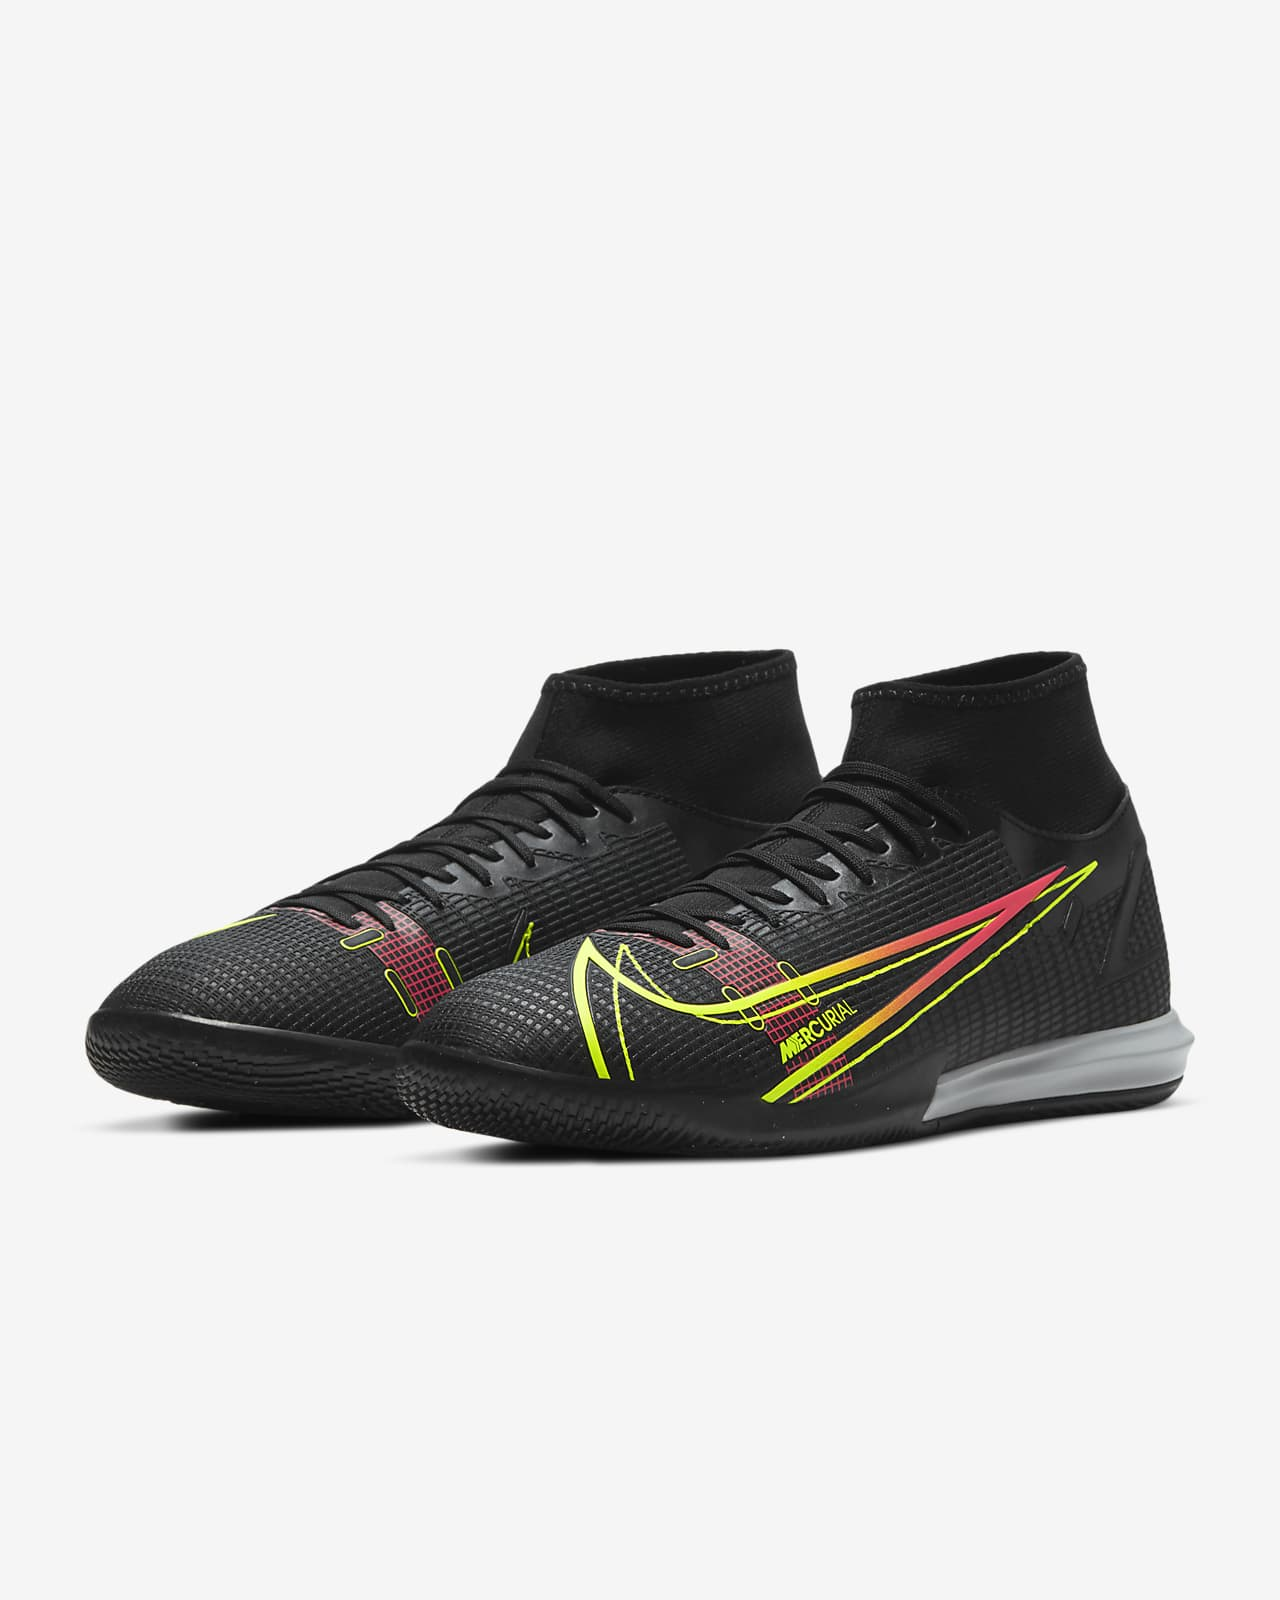 Halowe Buty Pilkarskie Nike Mercurial Superfly 8 Academy Ic Nike Pl